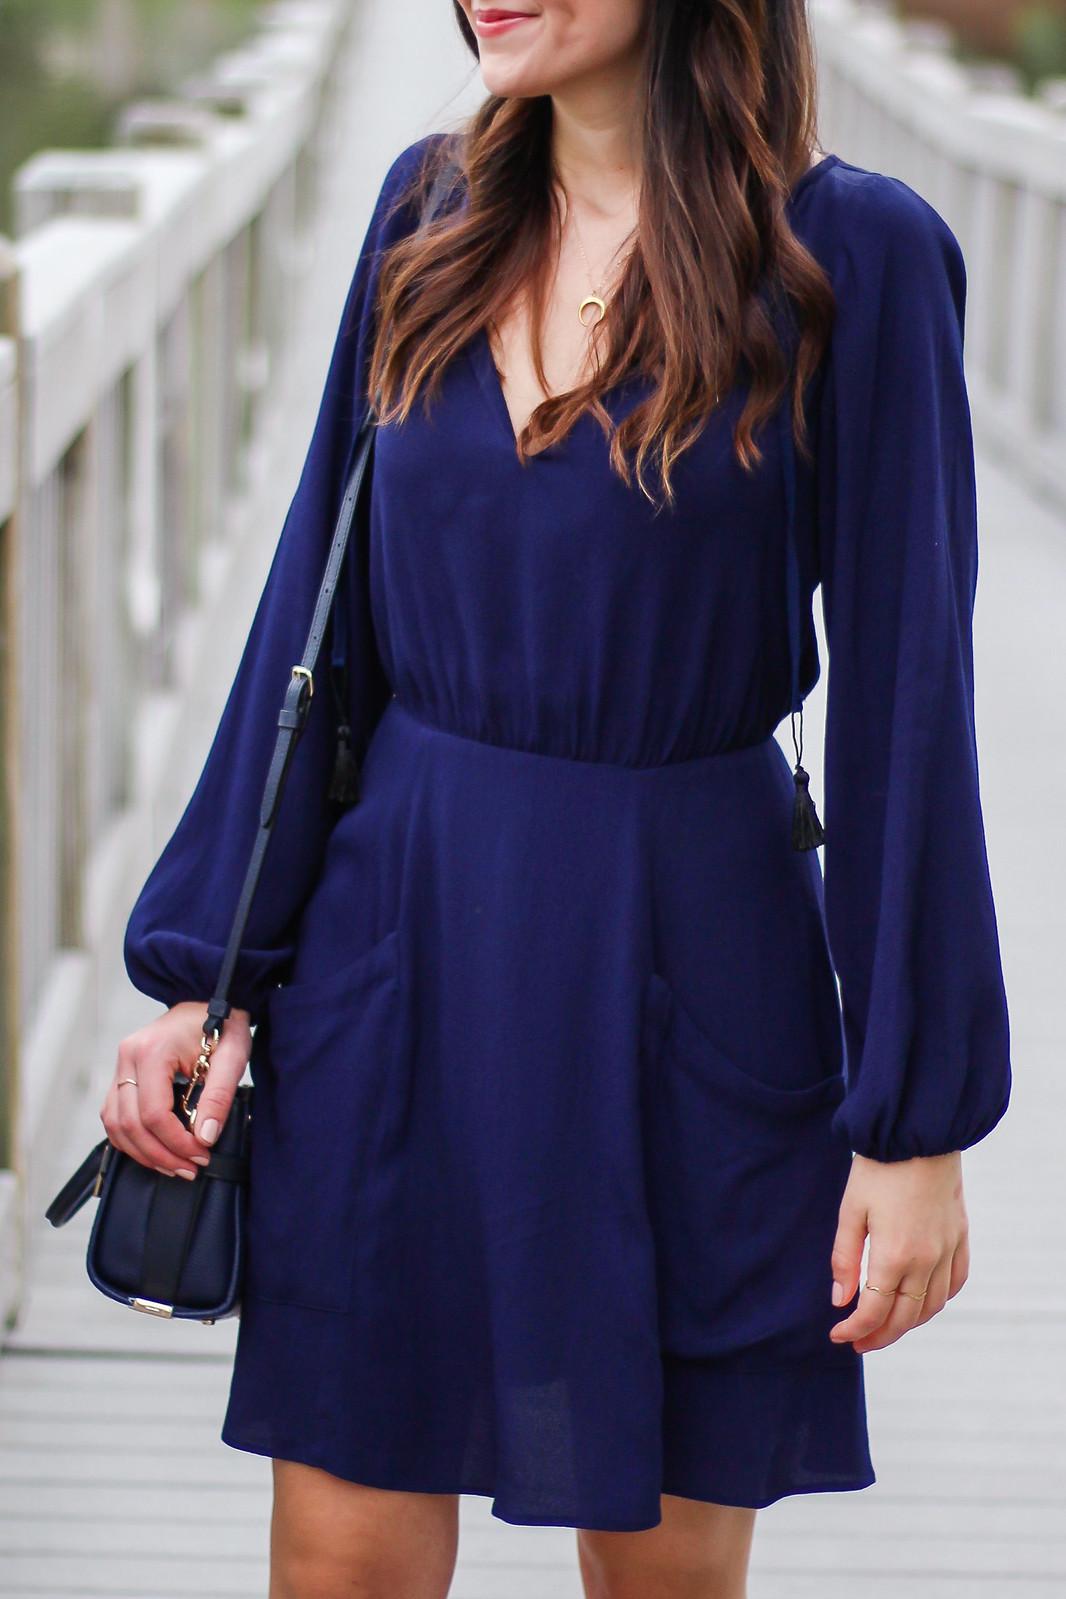 Reformation Purple Dress